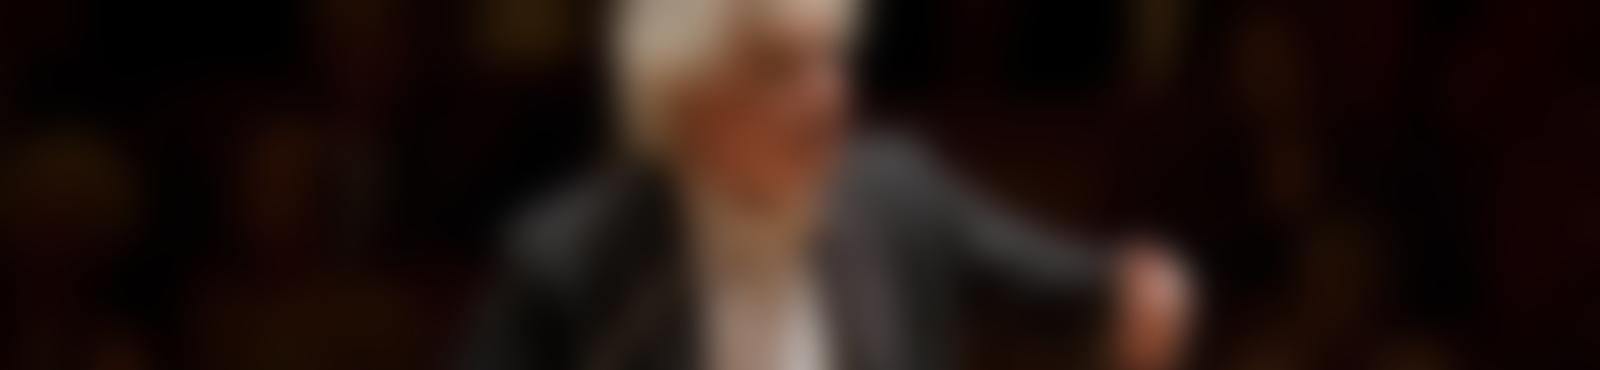 Blurred af6872ac f395 4108 a074 9f0869bbef5e